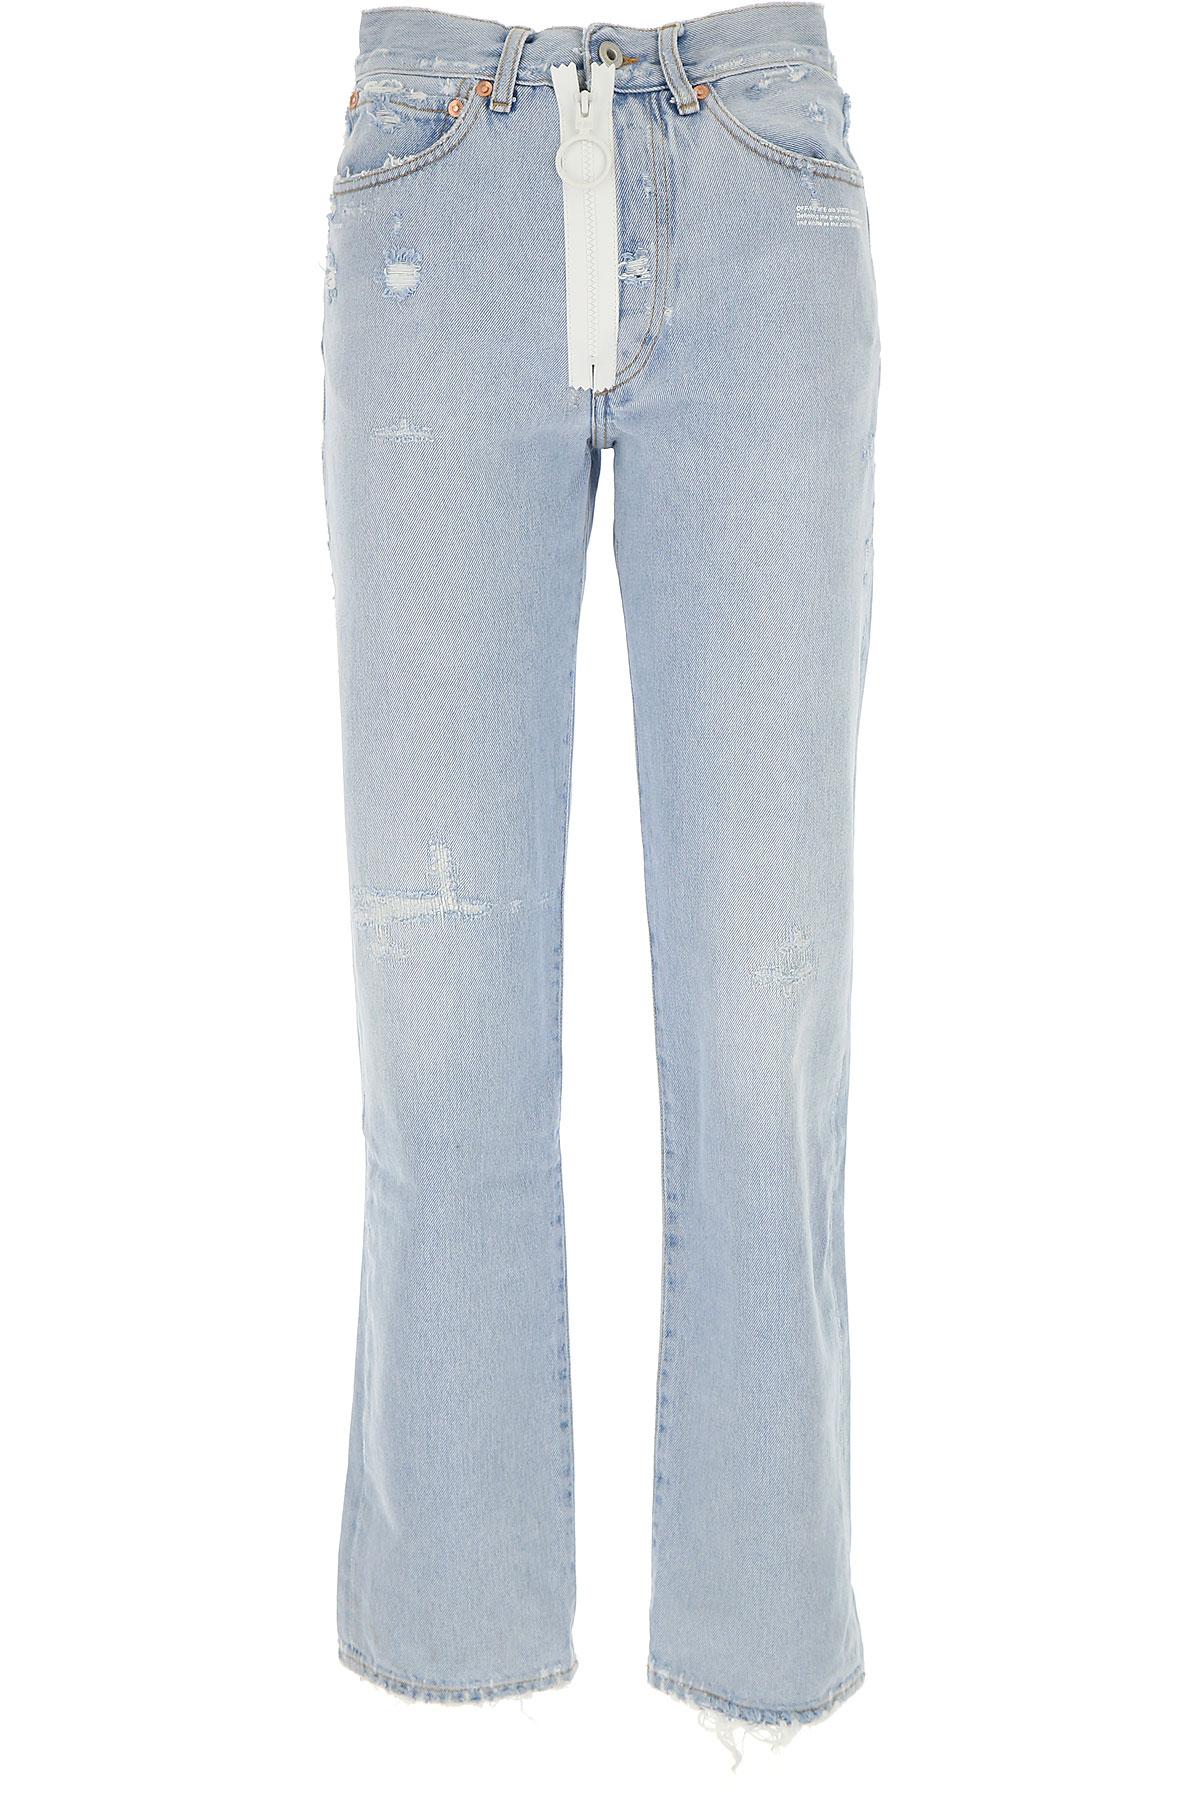 Off-White Virgil Abloh Jeans On Sale, Denim, Cotton, 2017, 10 6 8 USA-446075